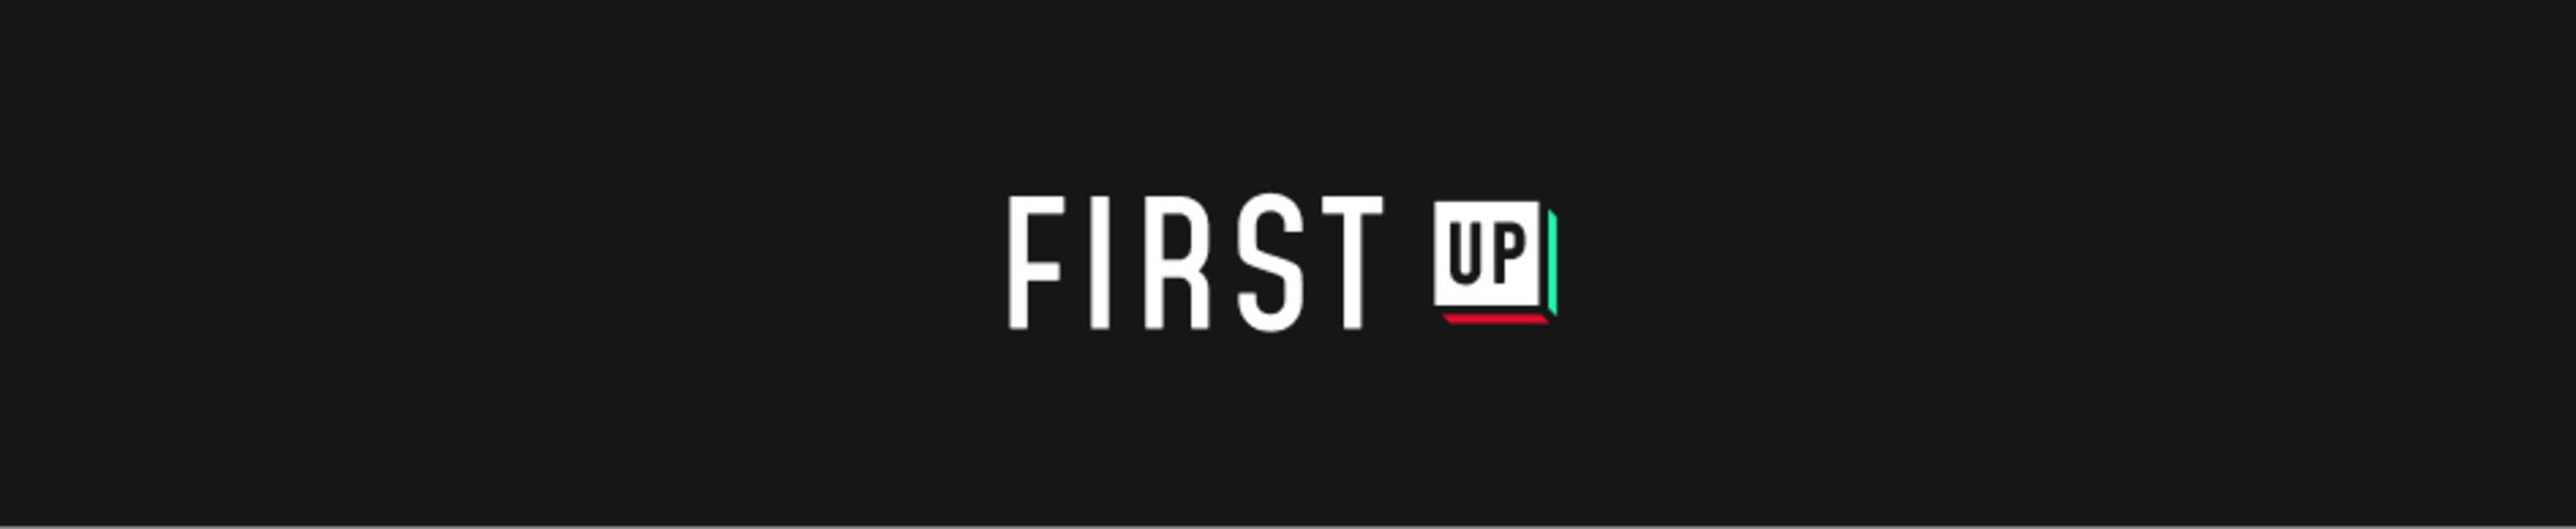 First UP